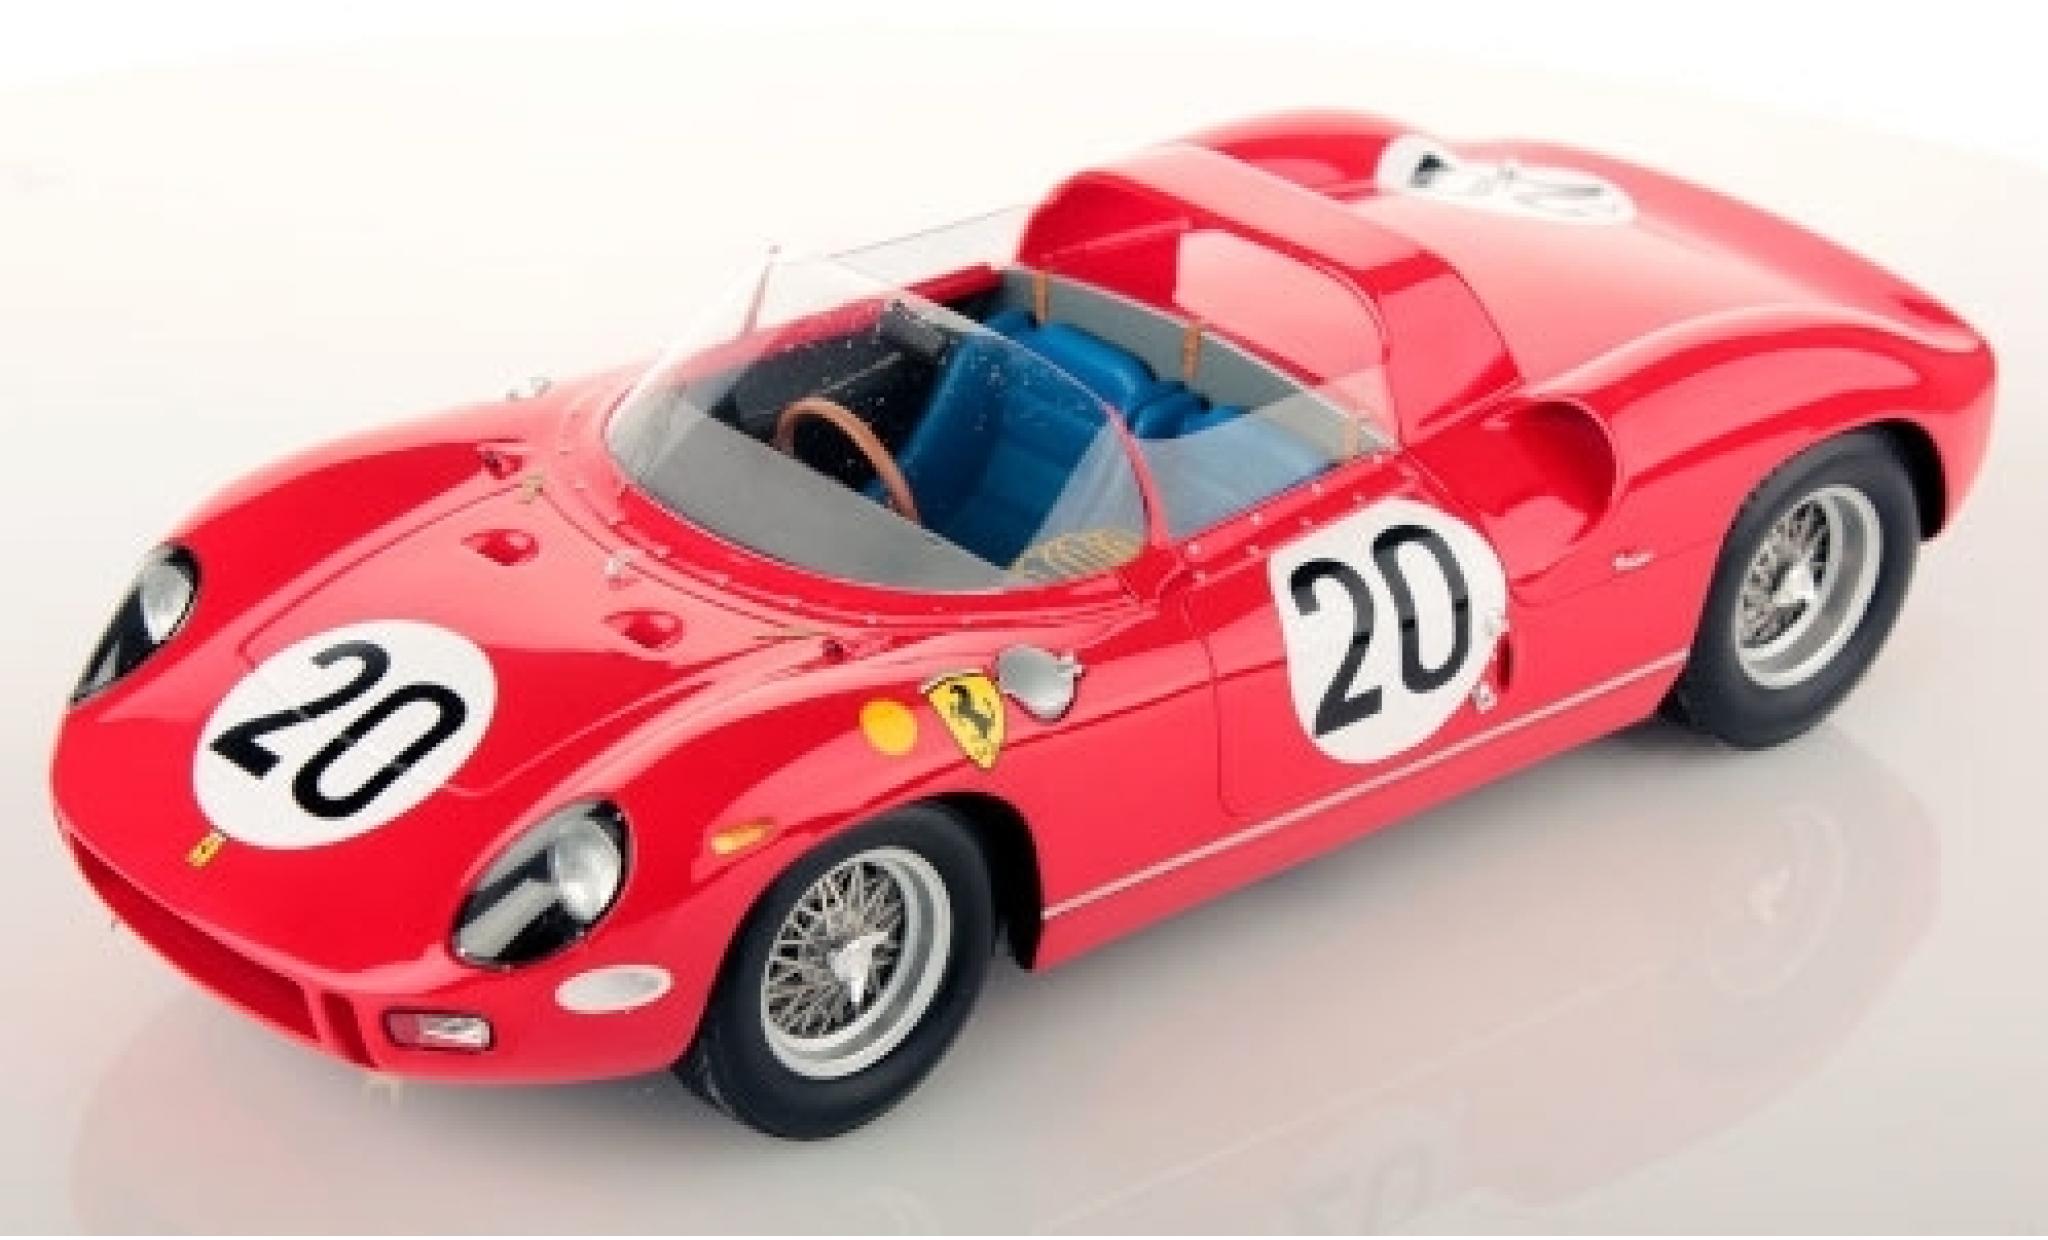 Ferrari 275 1/18 Look Smart P RHD No.20 Scuderia 24h Le Mans 1971 N.Vaccarella/J.Guichet